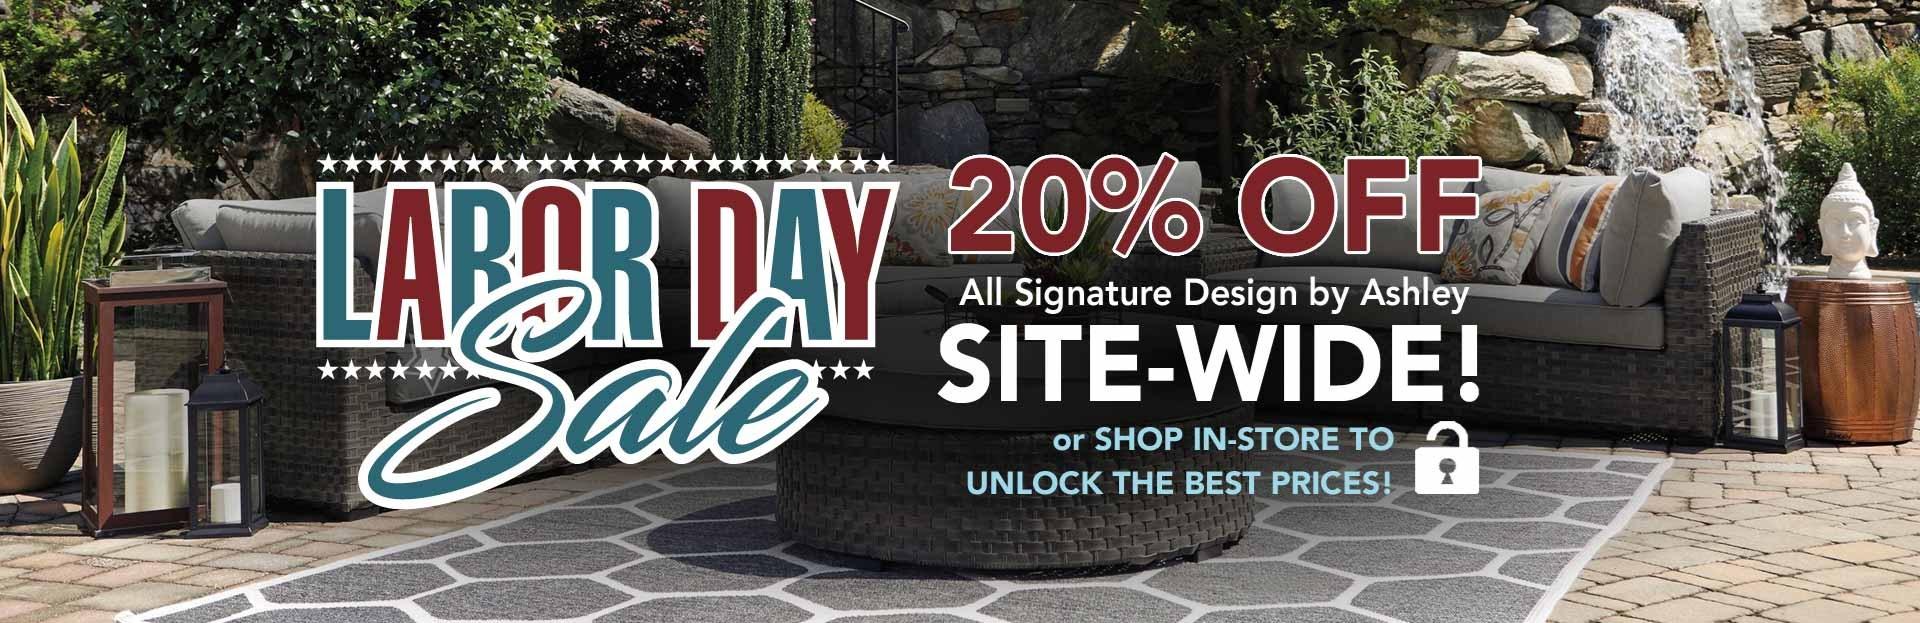 Labor Day Sale Royal Furniture